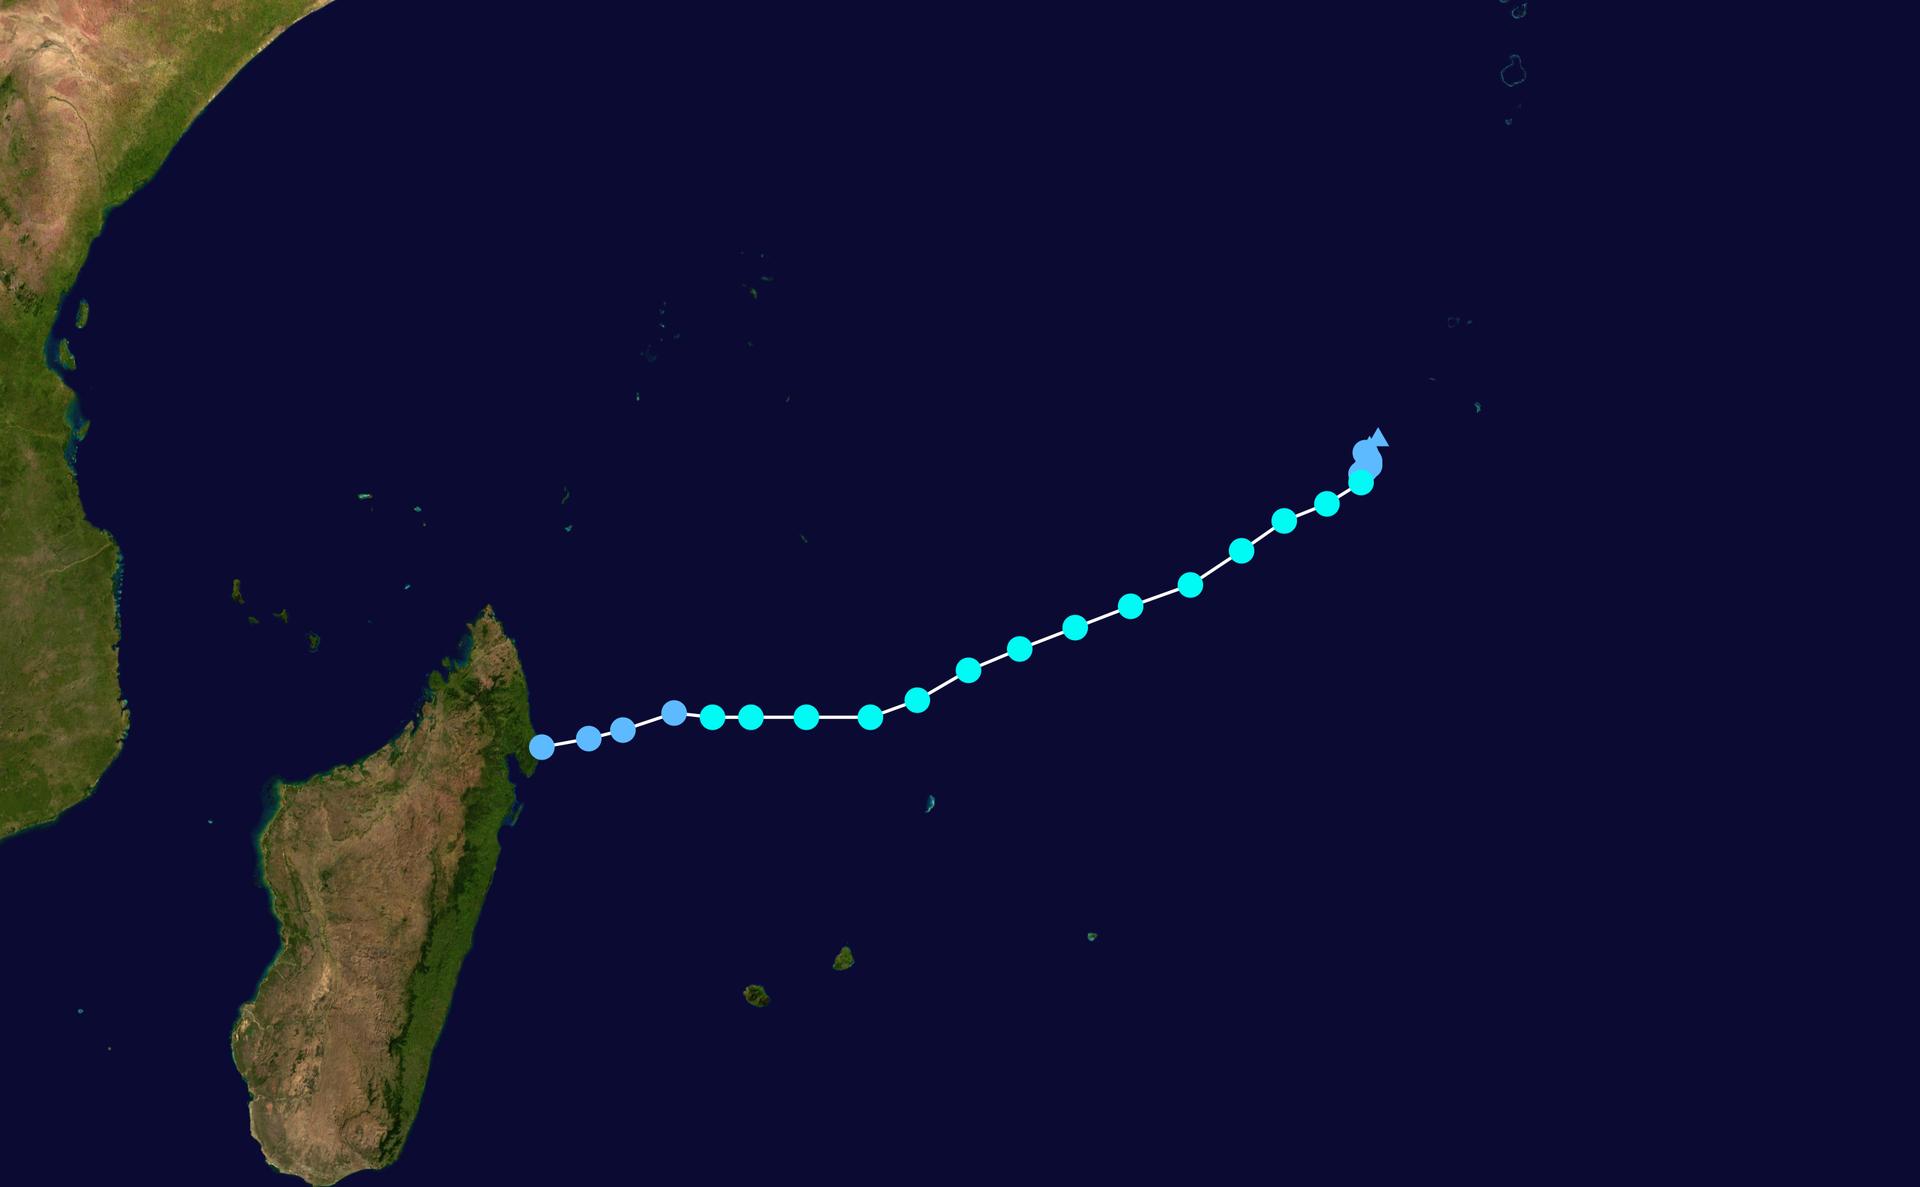 Ocean cyclone